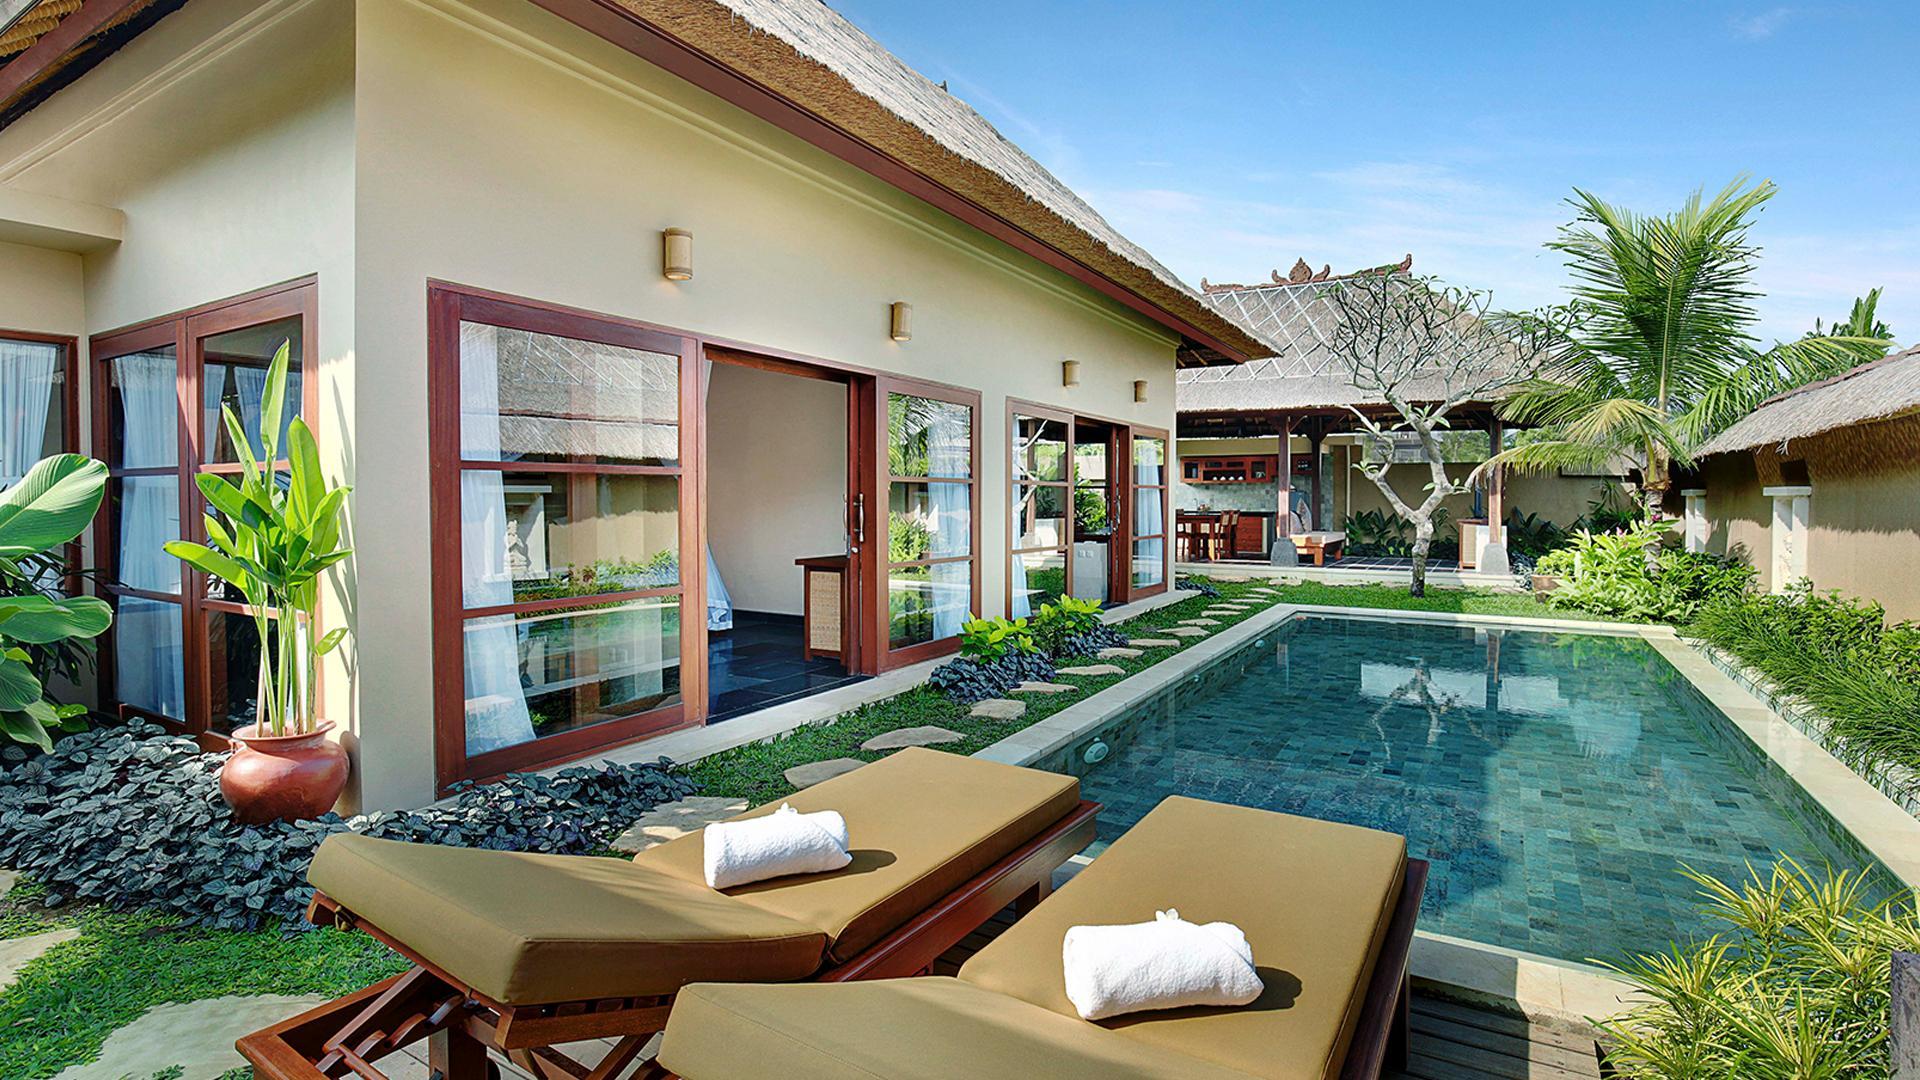 Two-Bedroom Pool Villa image 1 at Ubud Nyuh Bali Resort & Spa by Kabupaten Gianyar, Bali, Indonesia